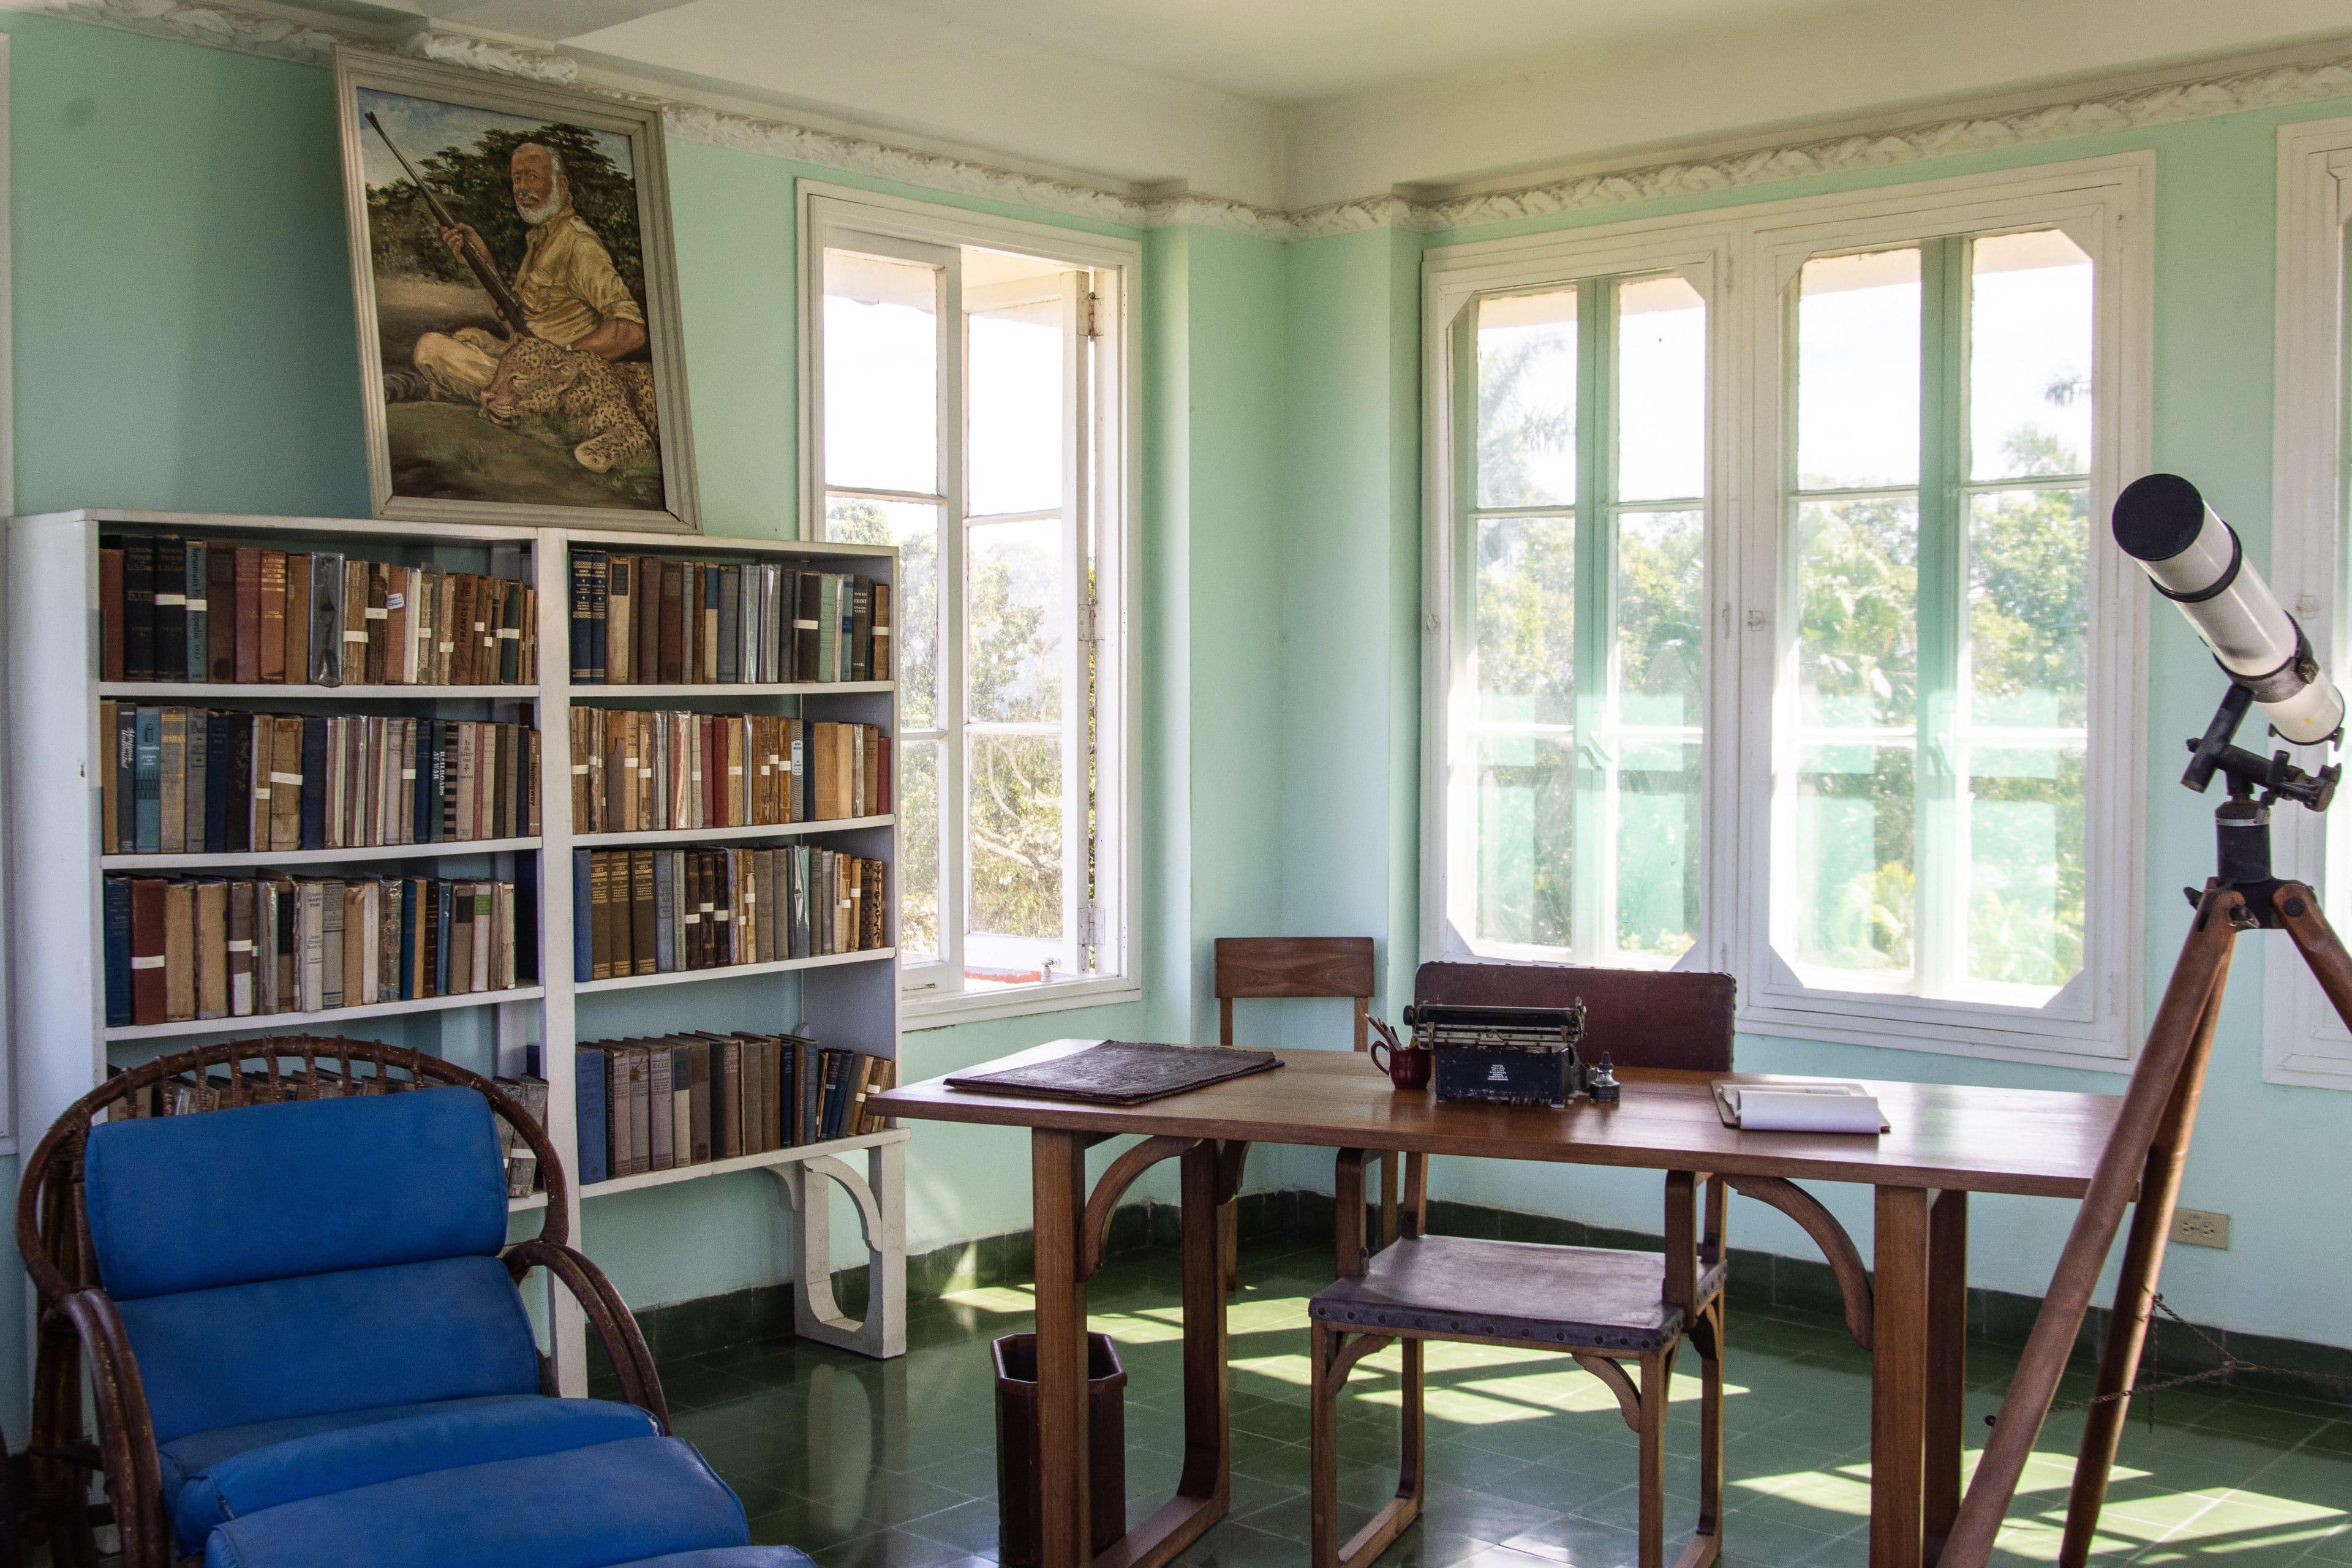 Zimmer im Hemingway Museum in Havanna, Kuba